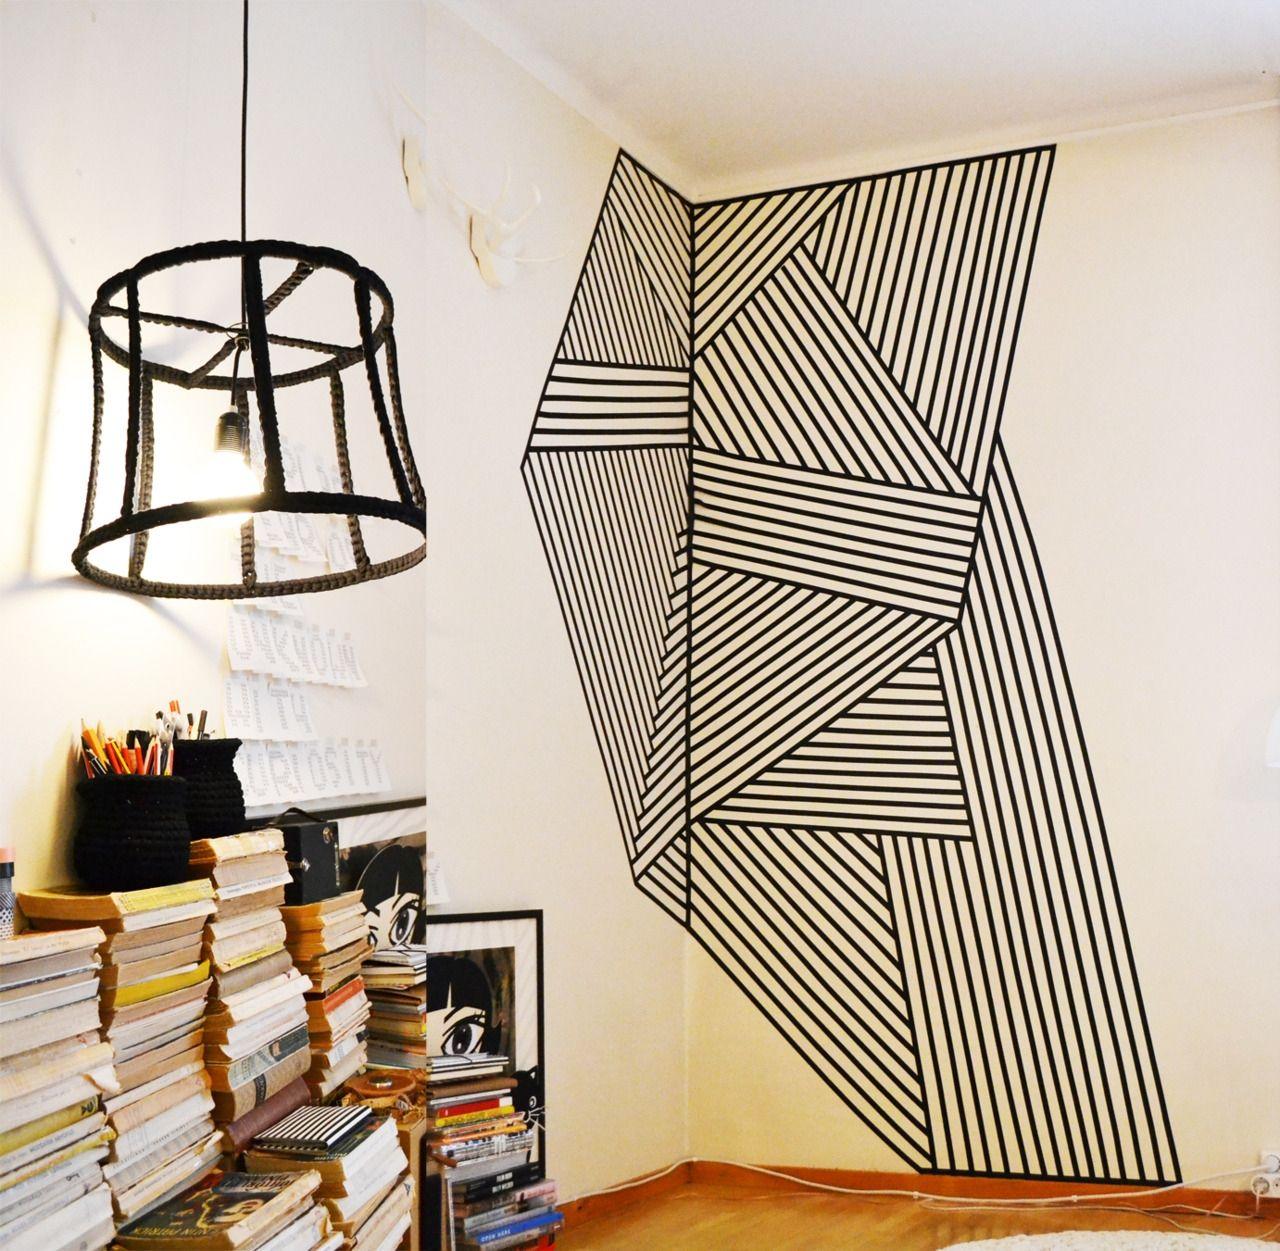 Washi Tape Wall Designs   http://ultimaterpmod.us/   Pinterest ...